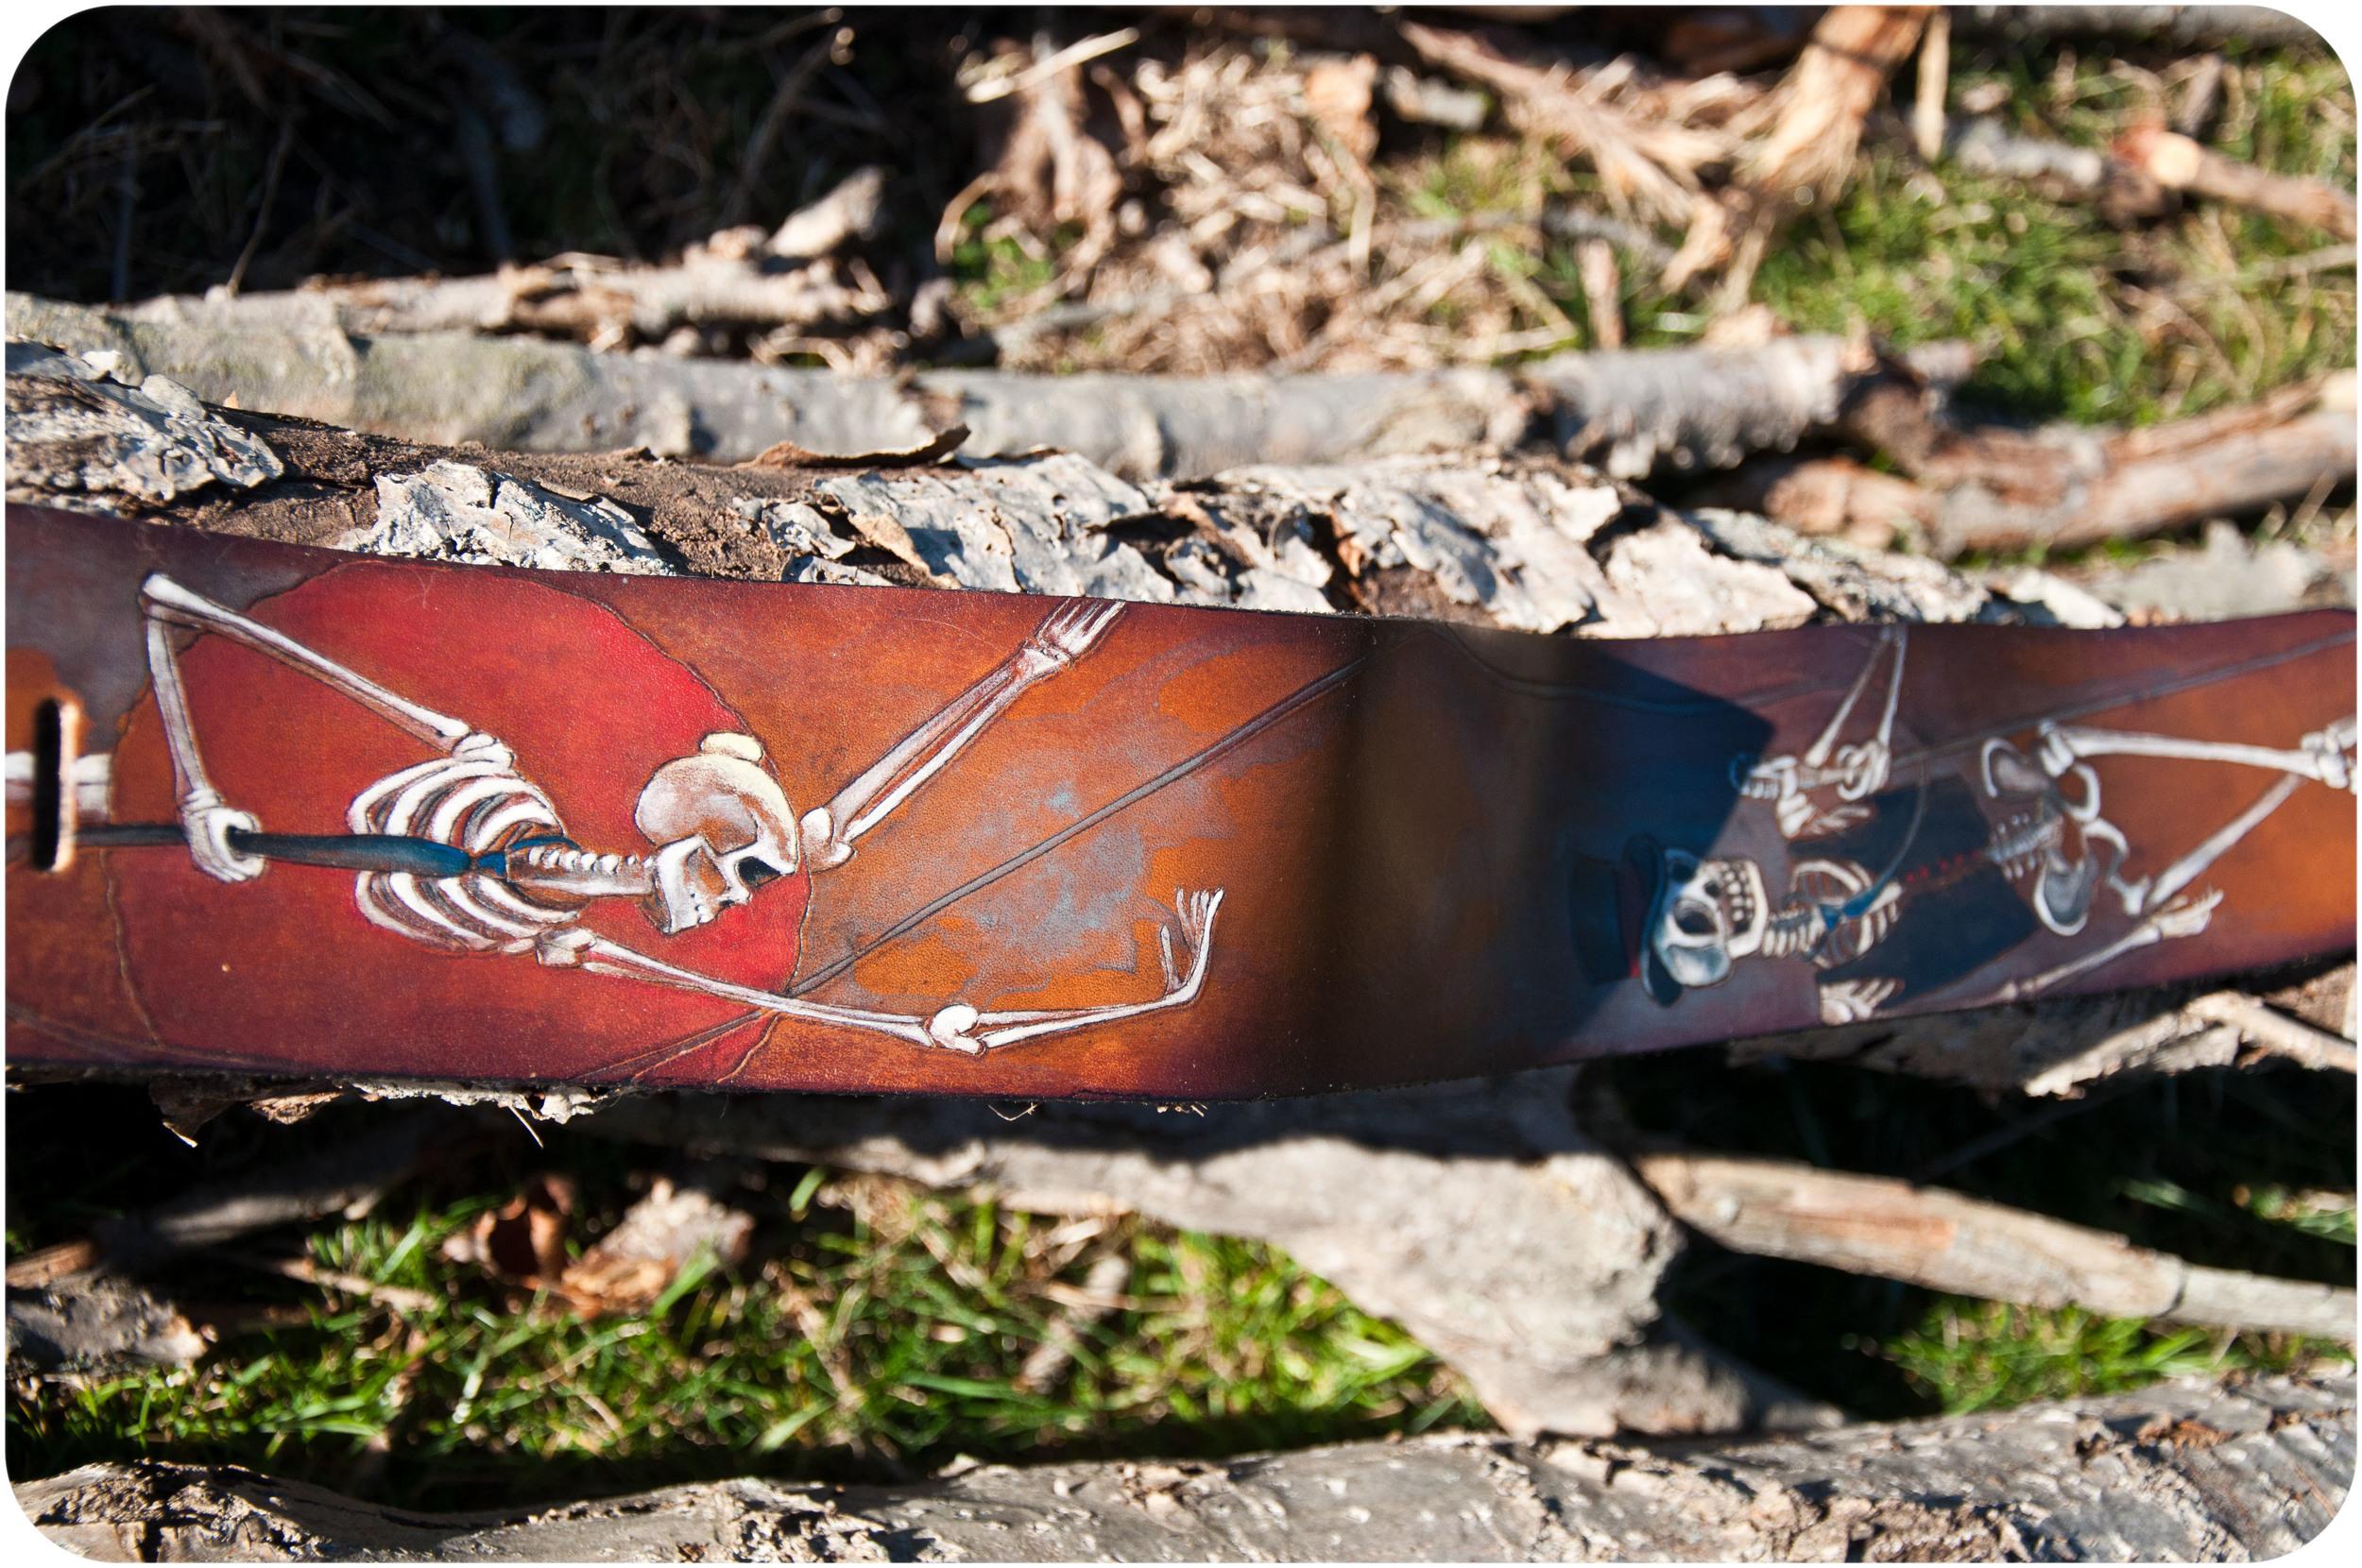 skeleton-guitar-strap-13.jpg